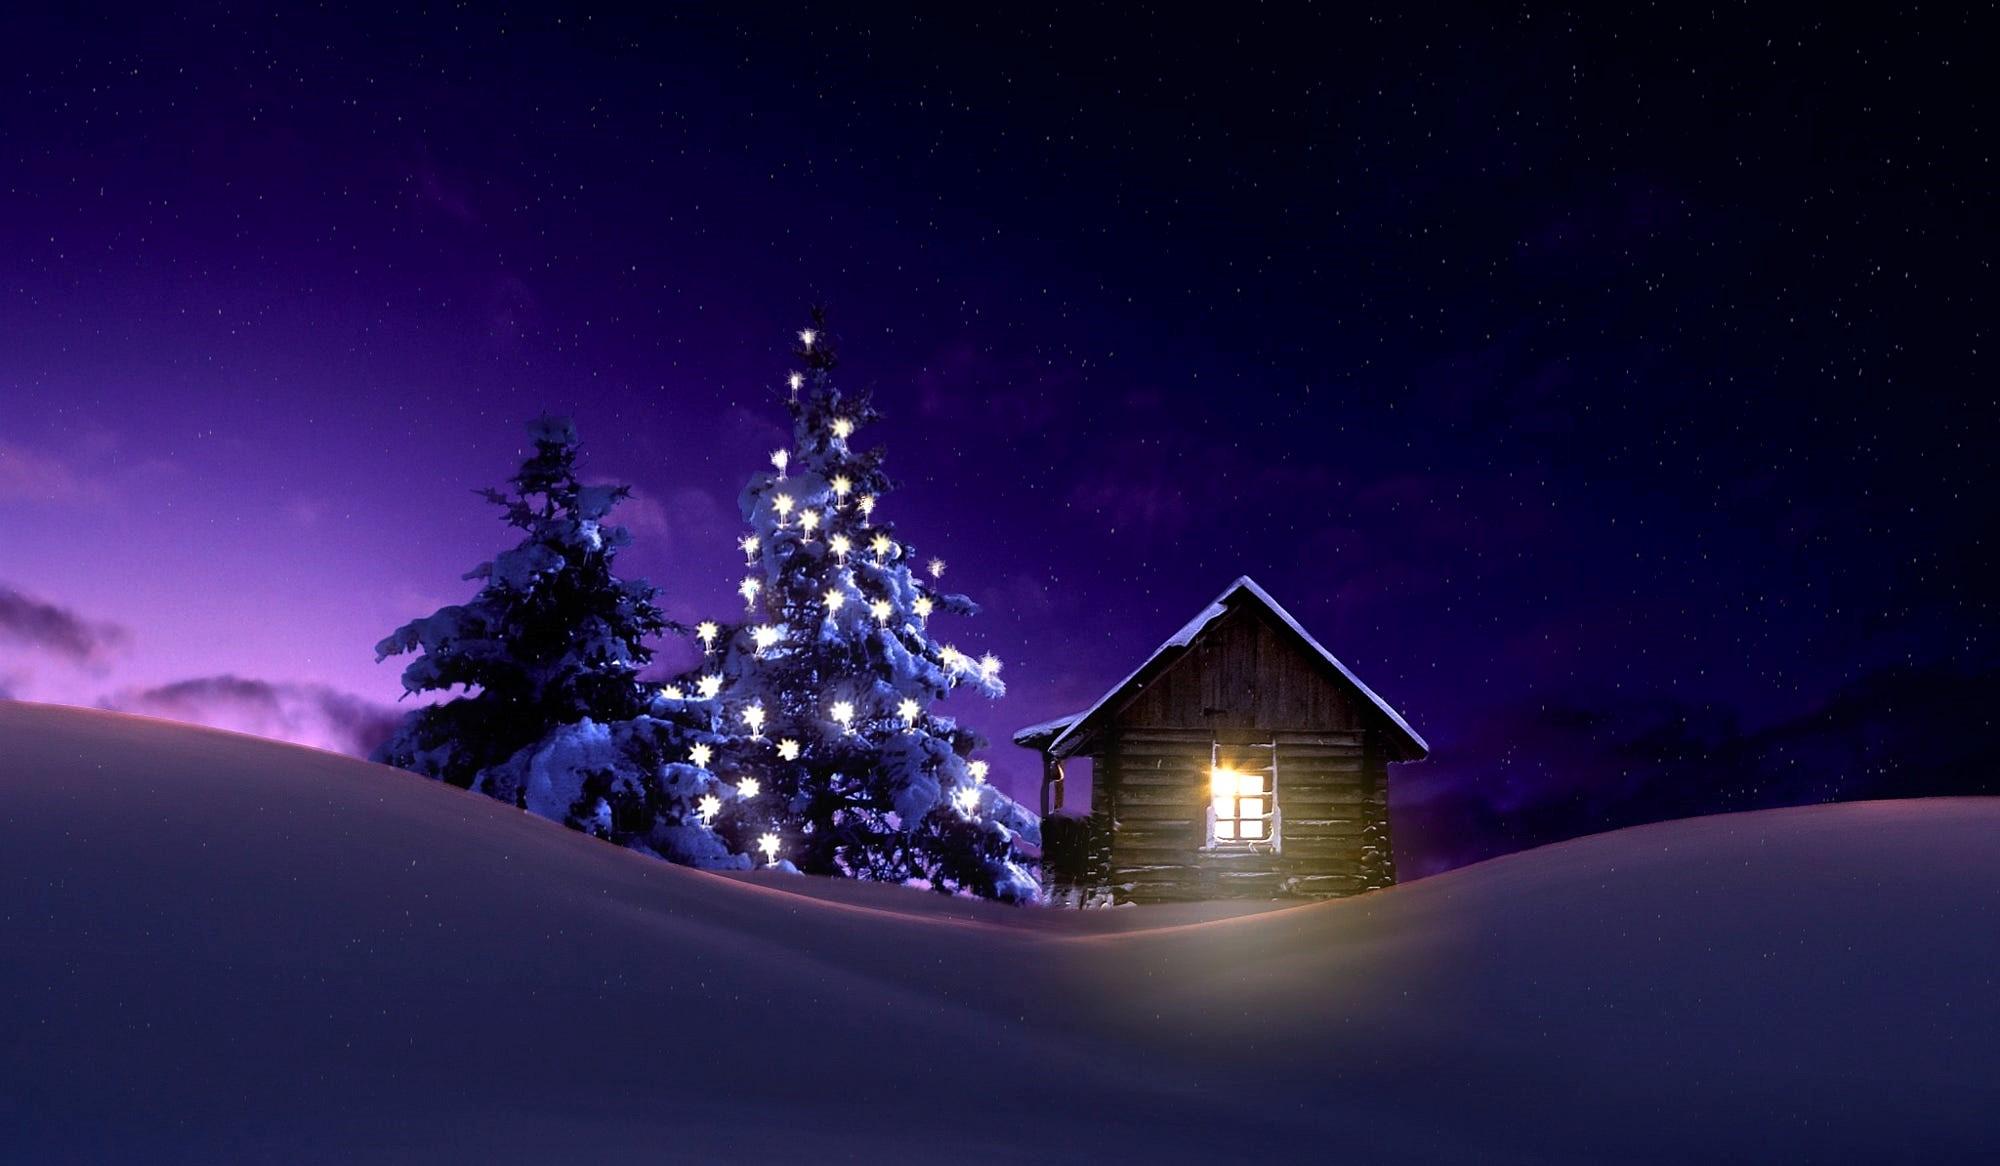 Cabin Christmas Light Night Snow Tree Winter 2000x1166